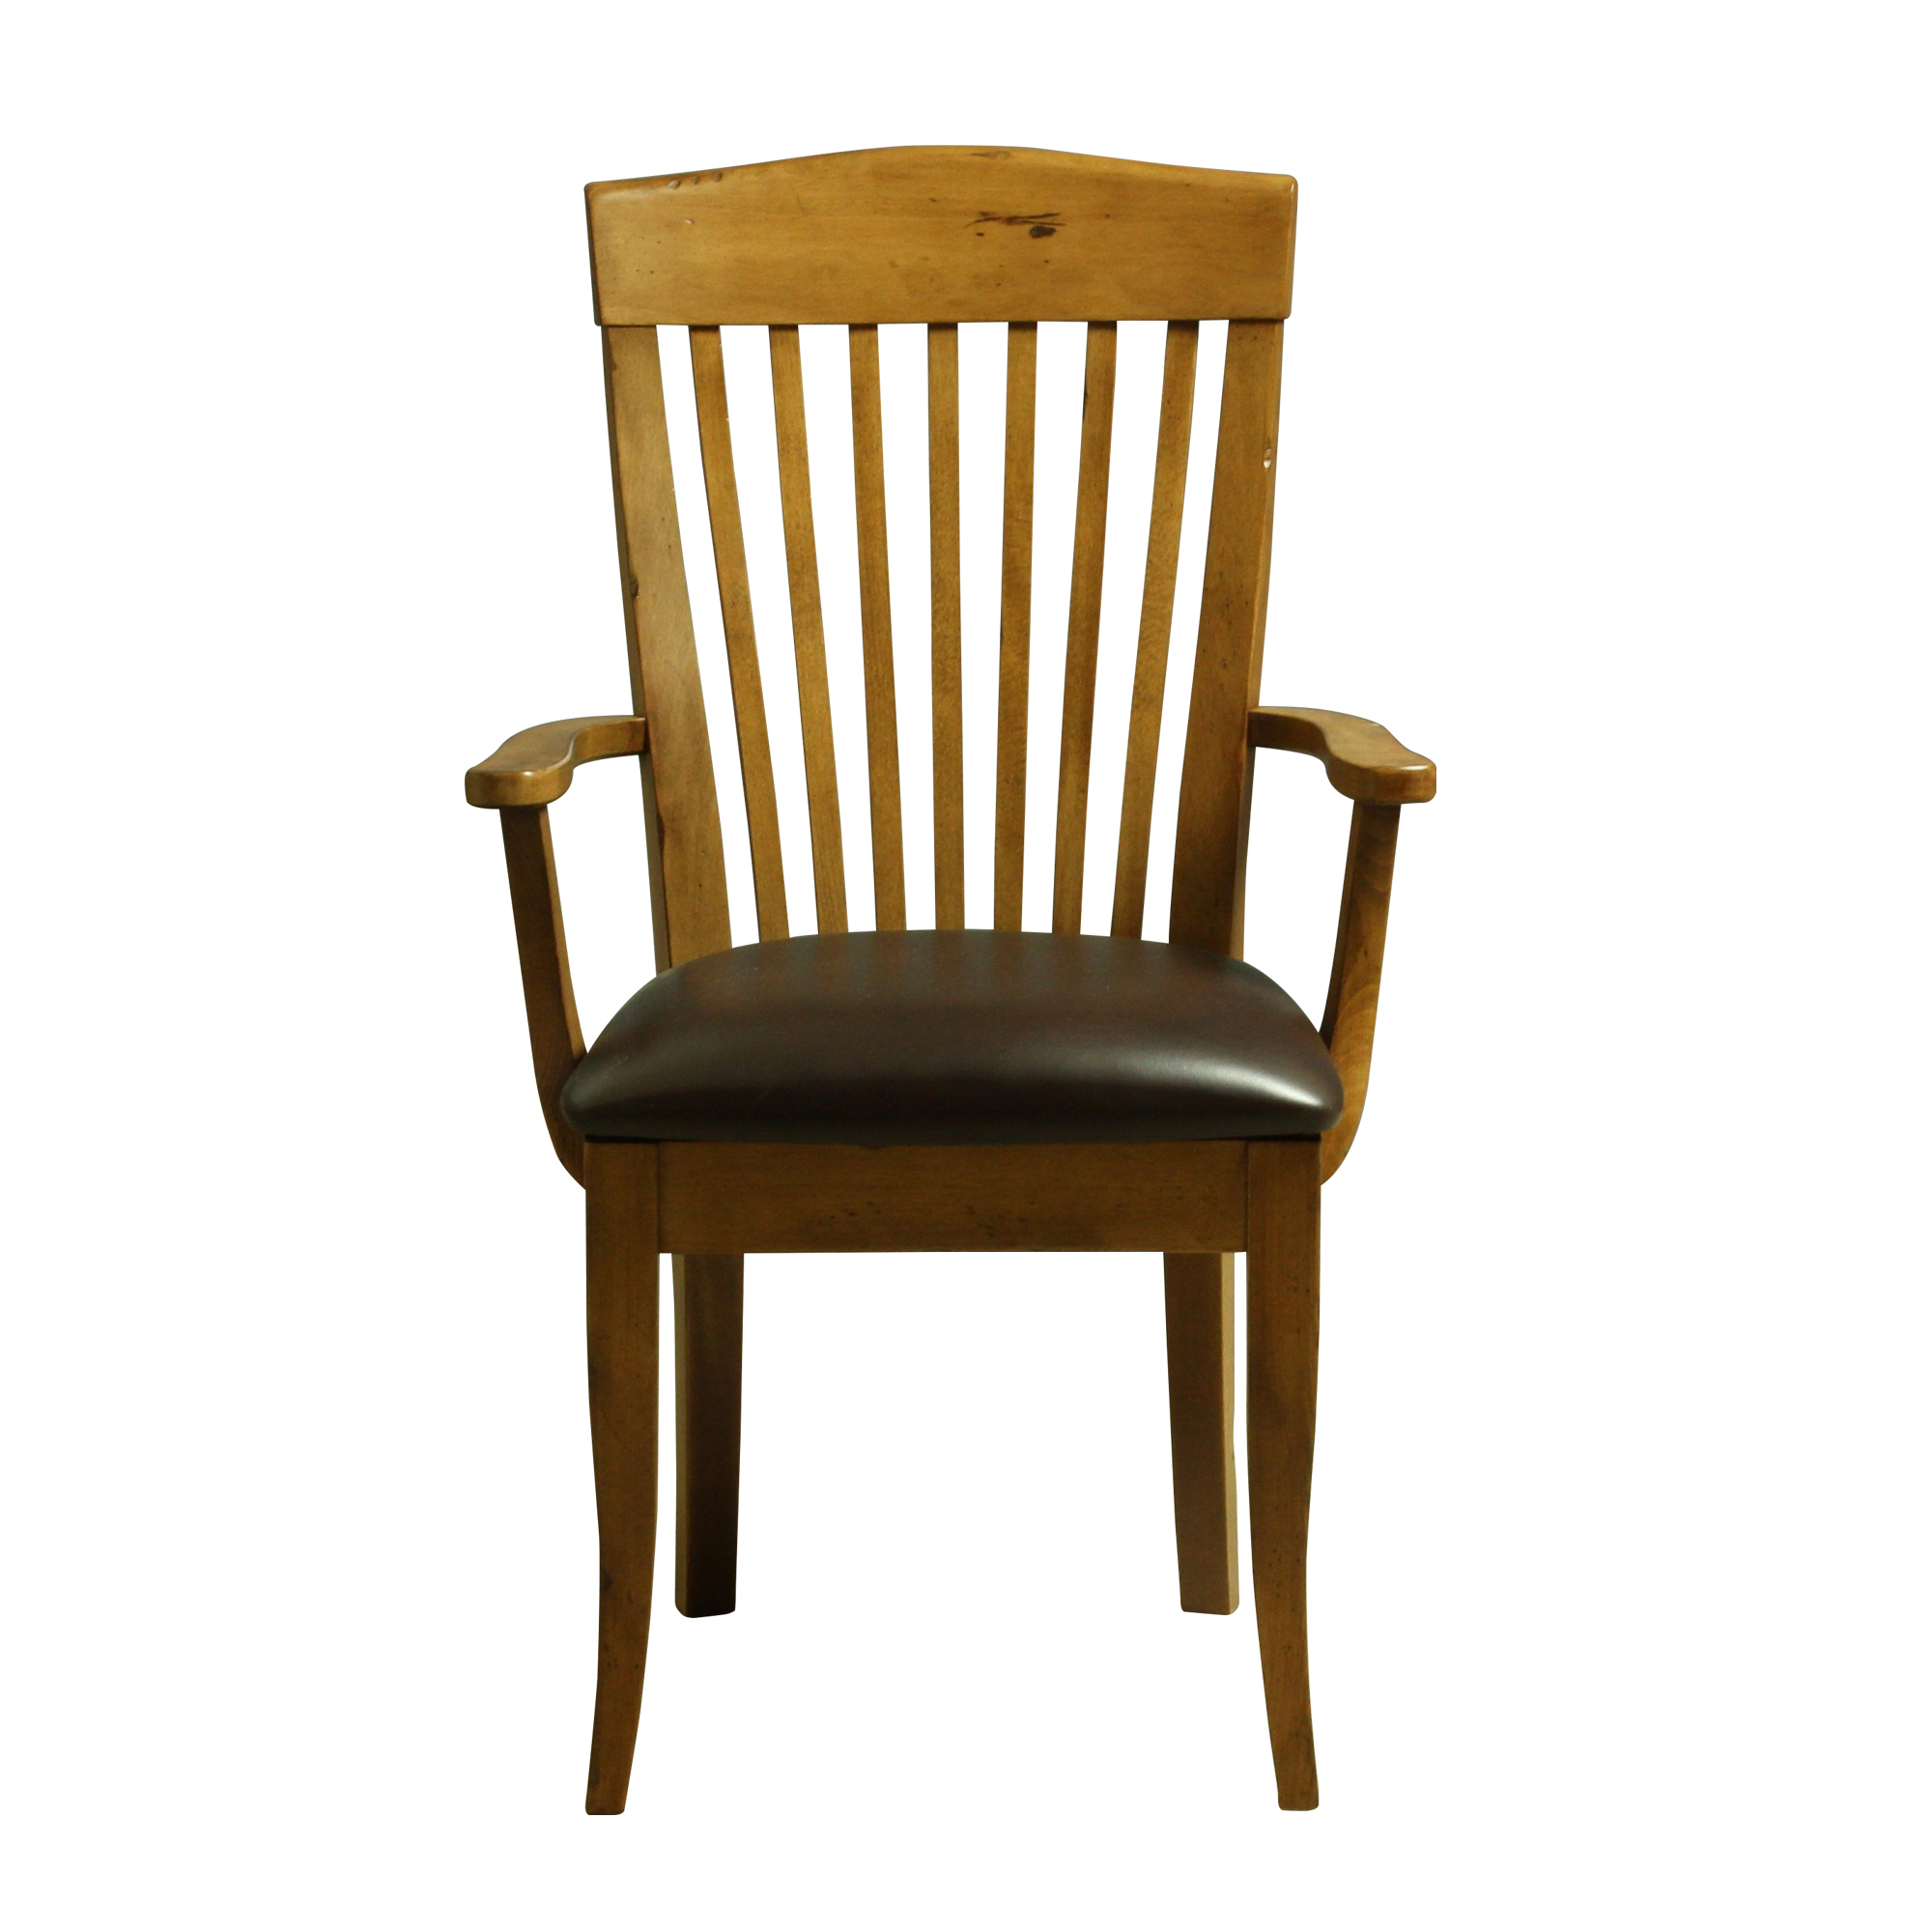 Model 53 Arm Chair Upholstered